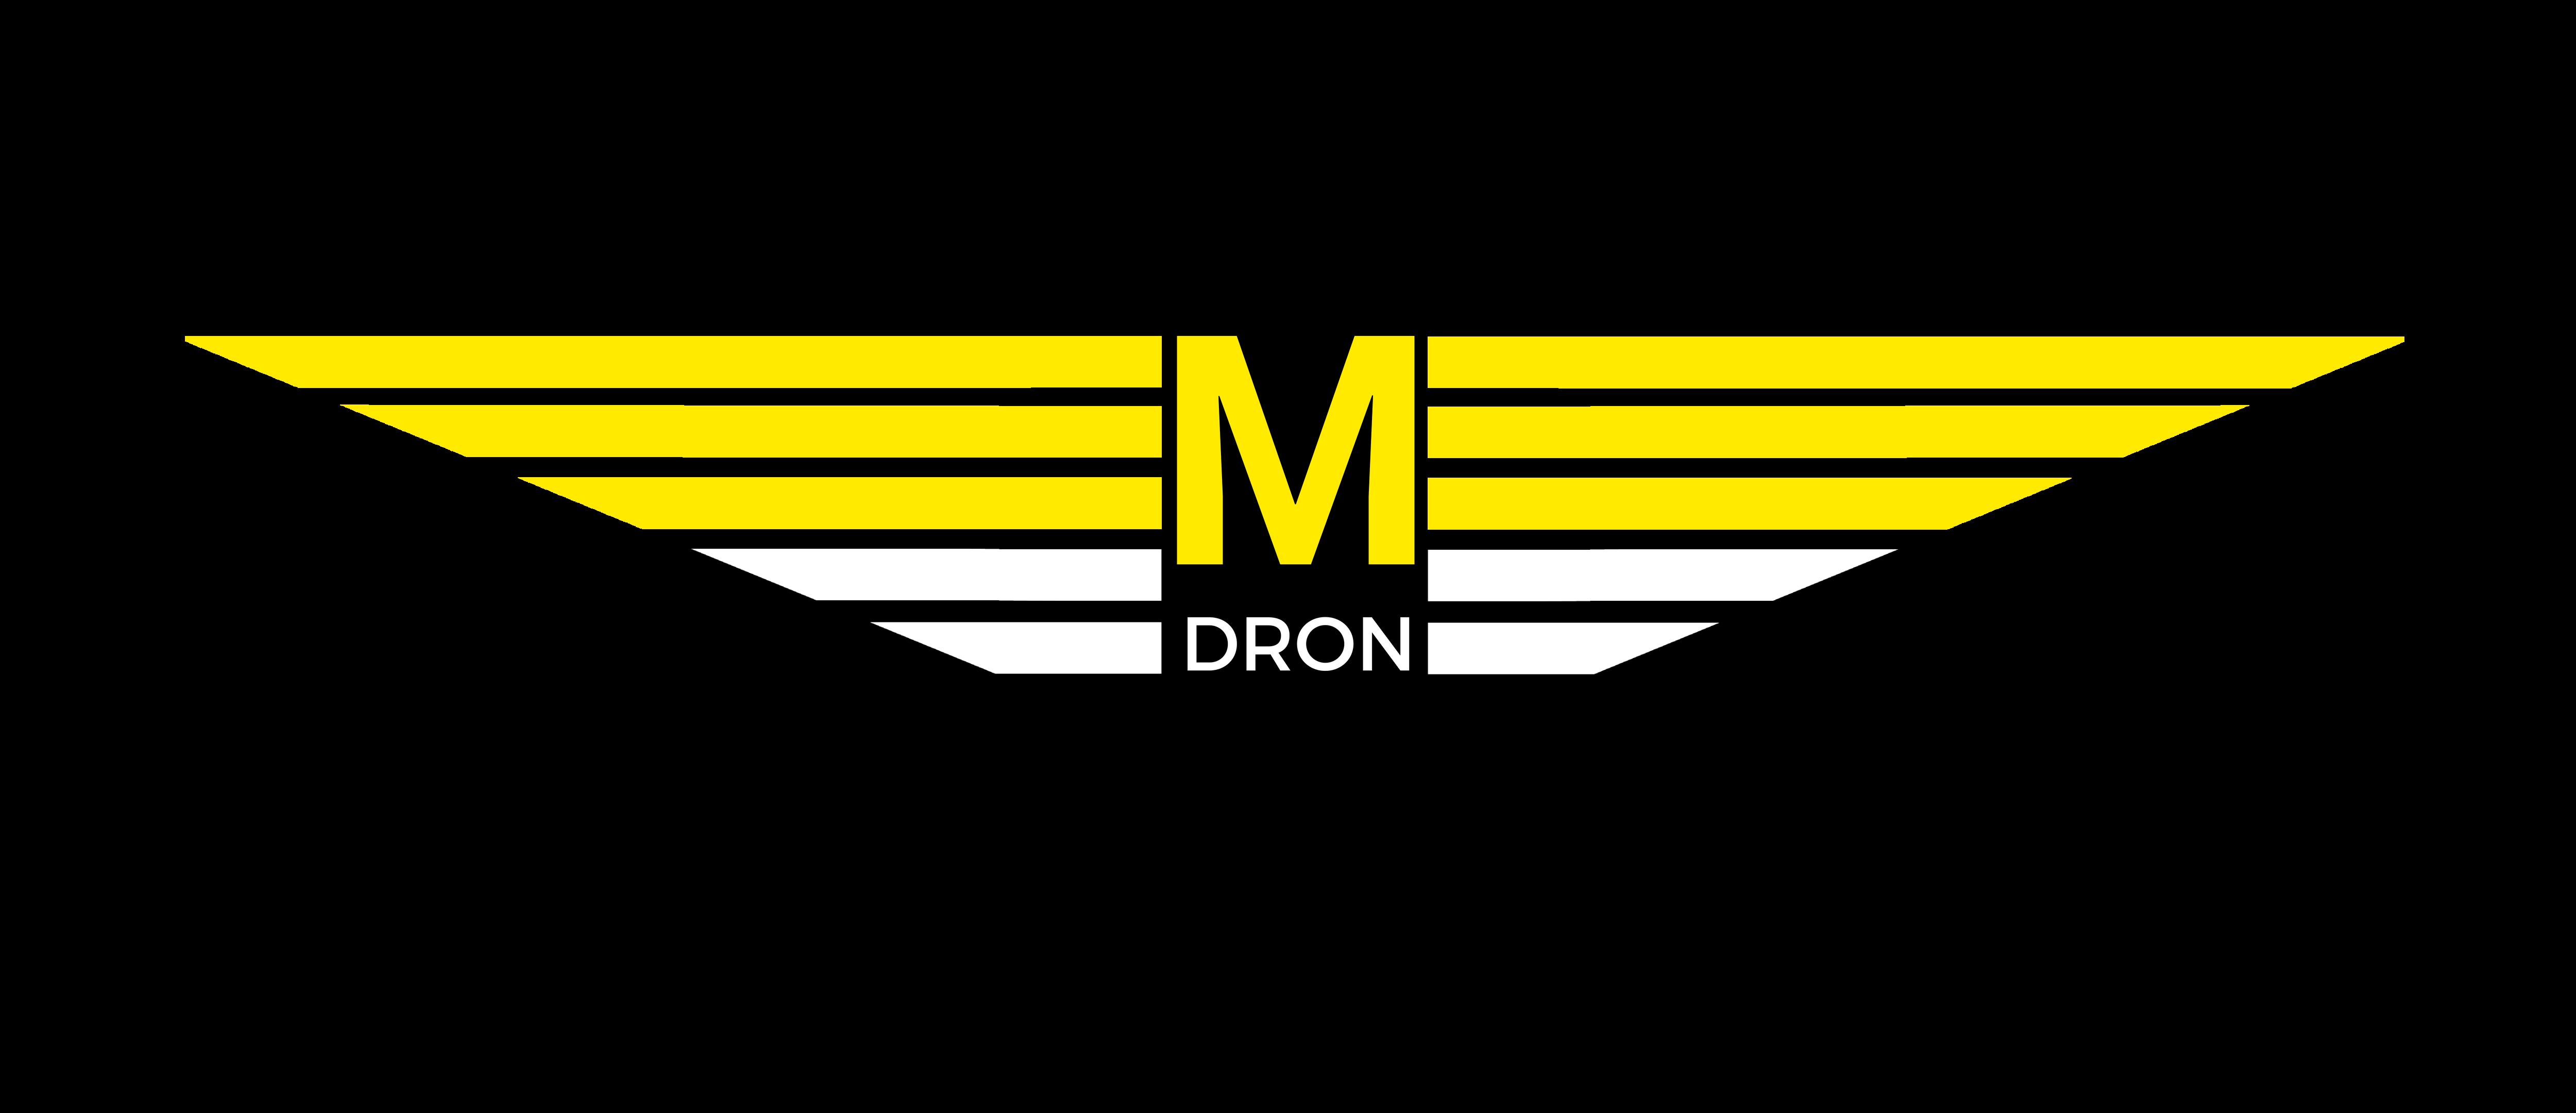 M-DRON_5000x2160__rev_1.1